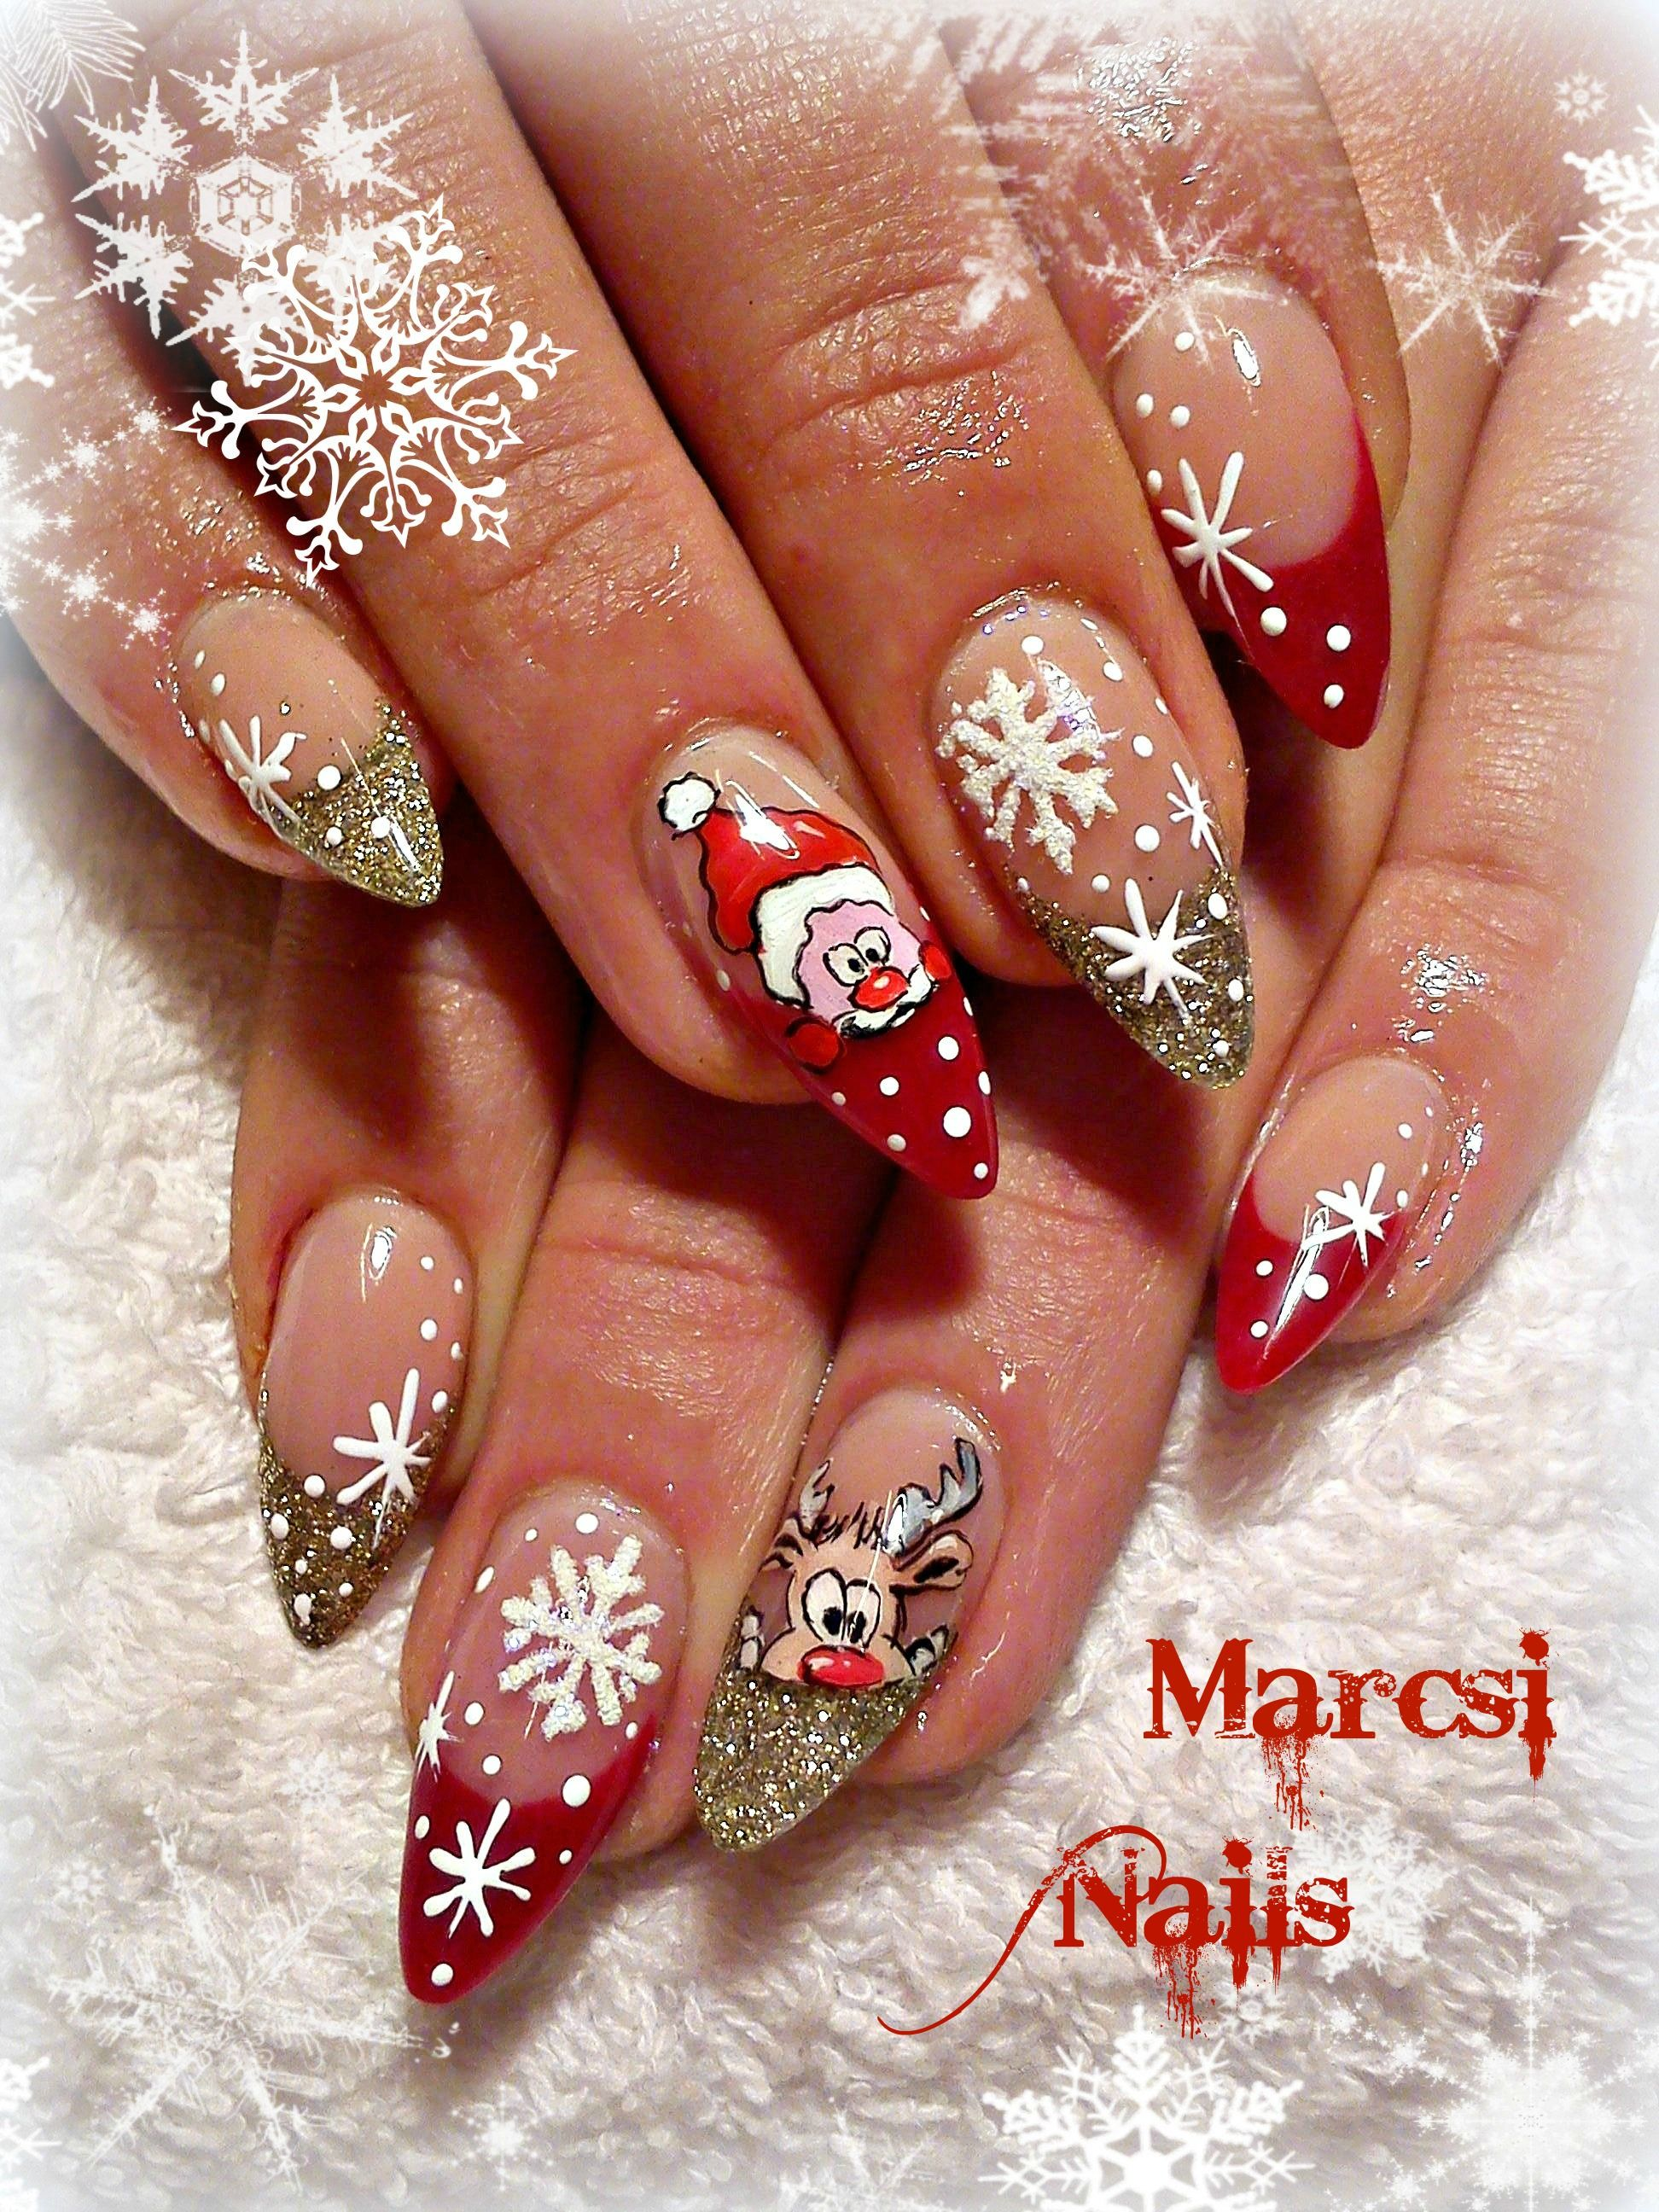 Xmas Nail Rudolf Santa Claus Nail Fantasie Per Unghie Natalizie Unghie Gel Unghie Graziose